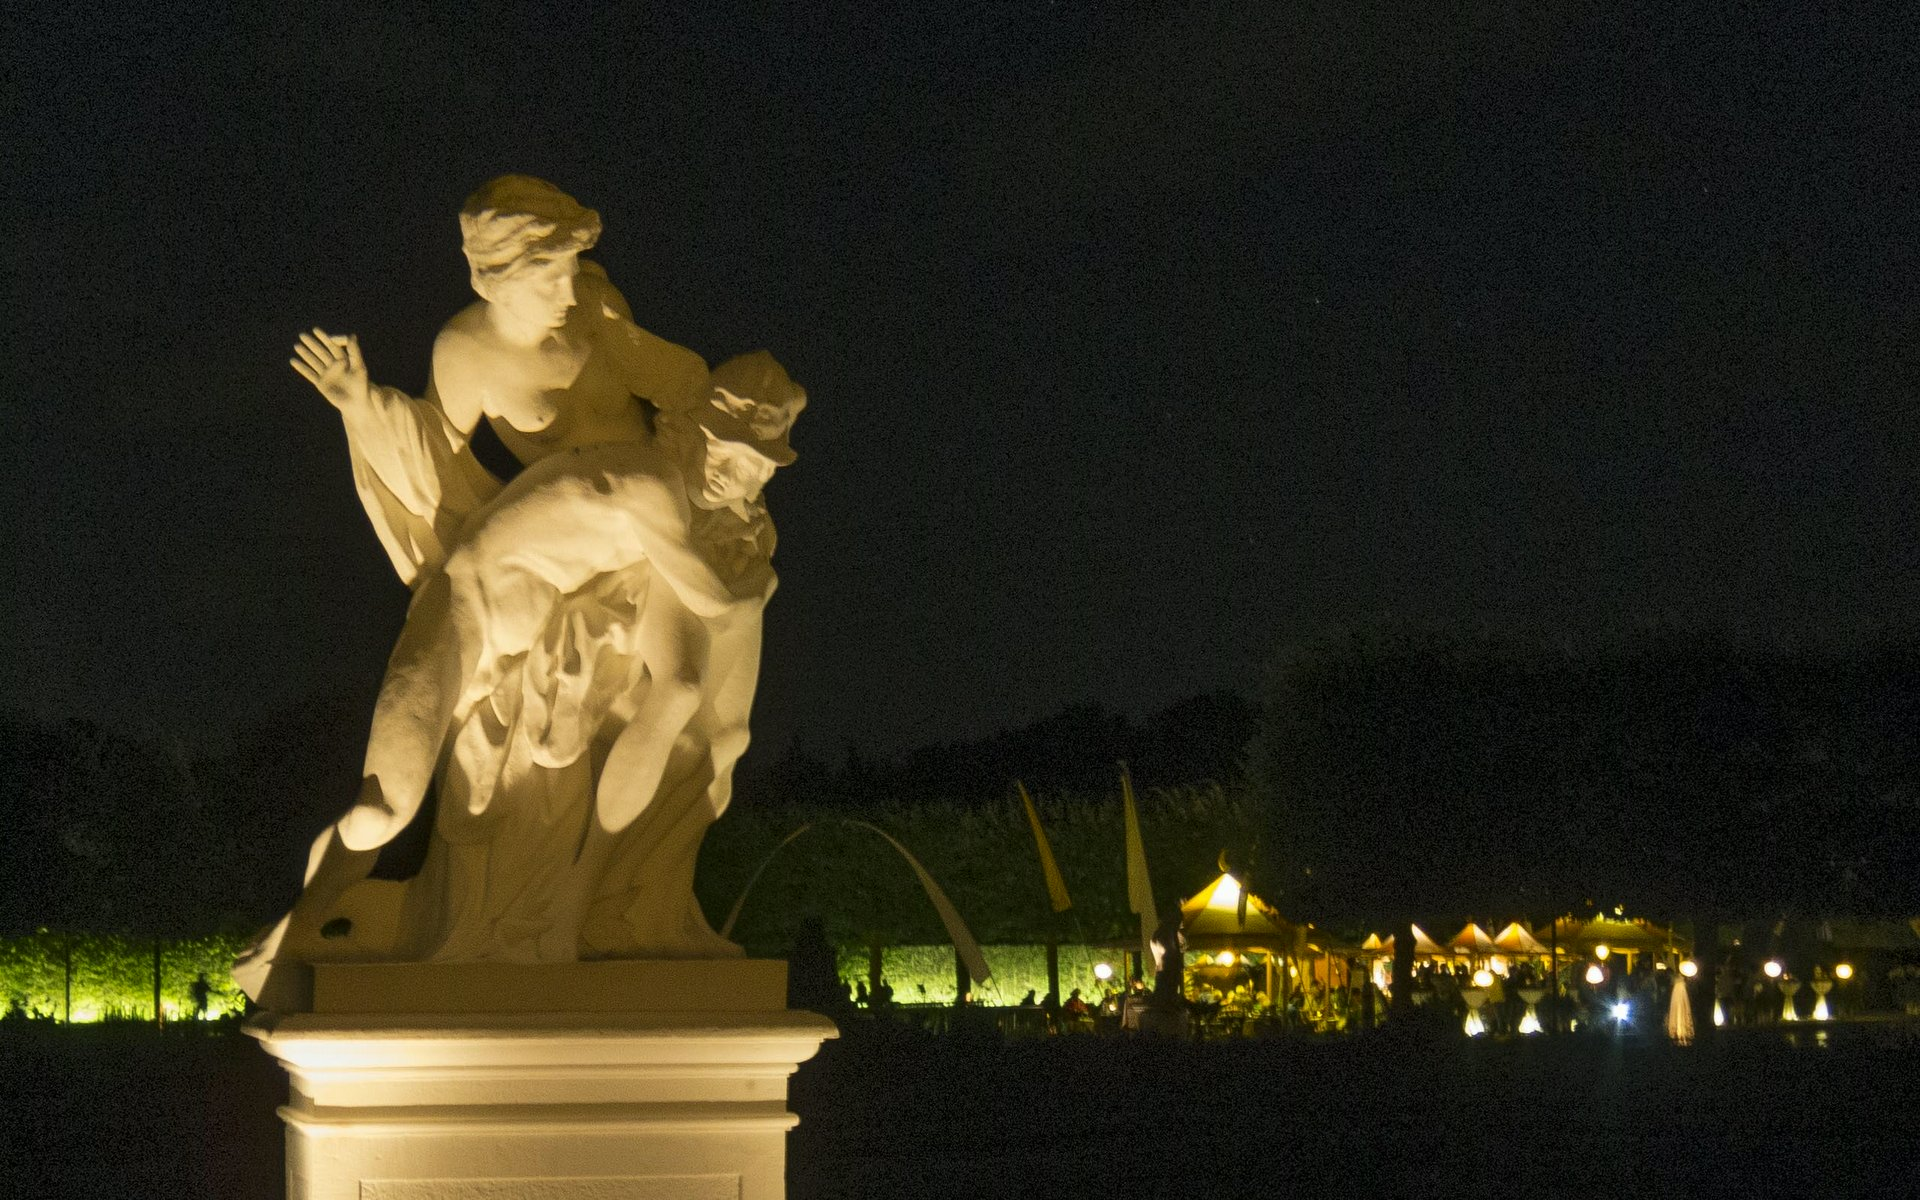 Illumination: Merkur und Psyche, Moccamaker